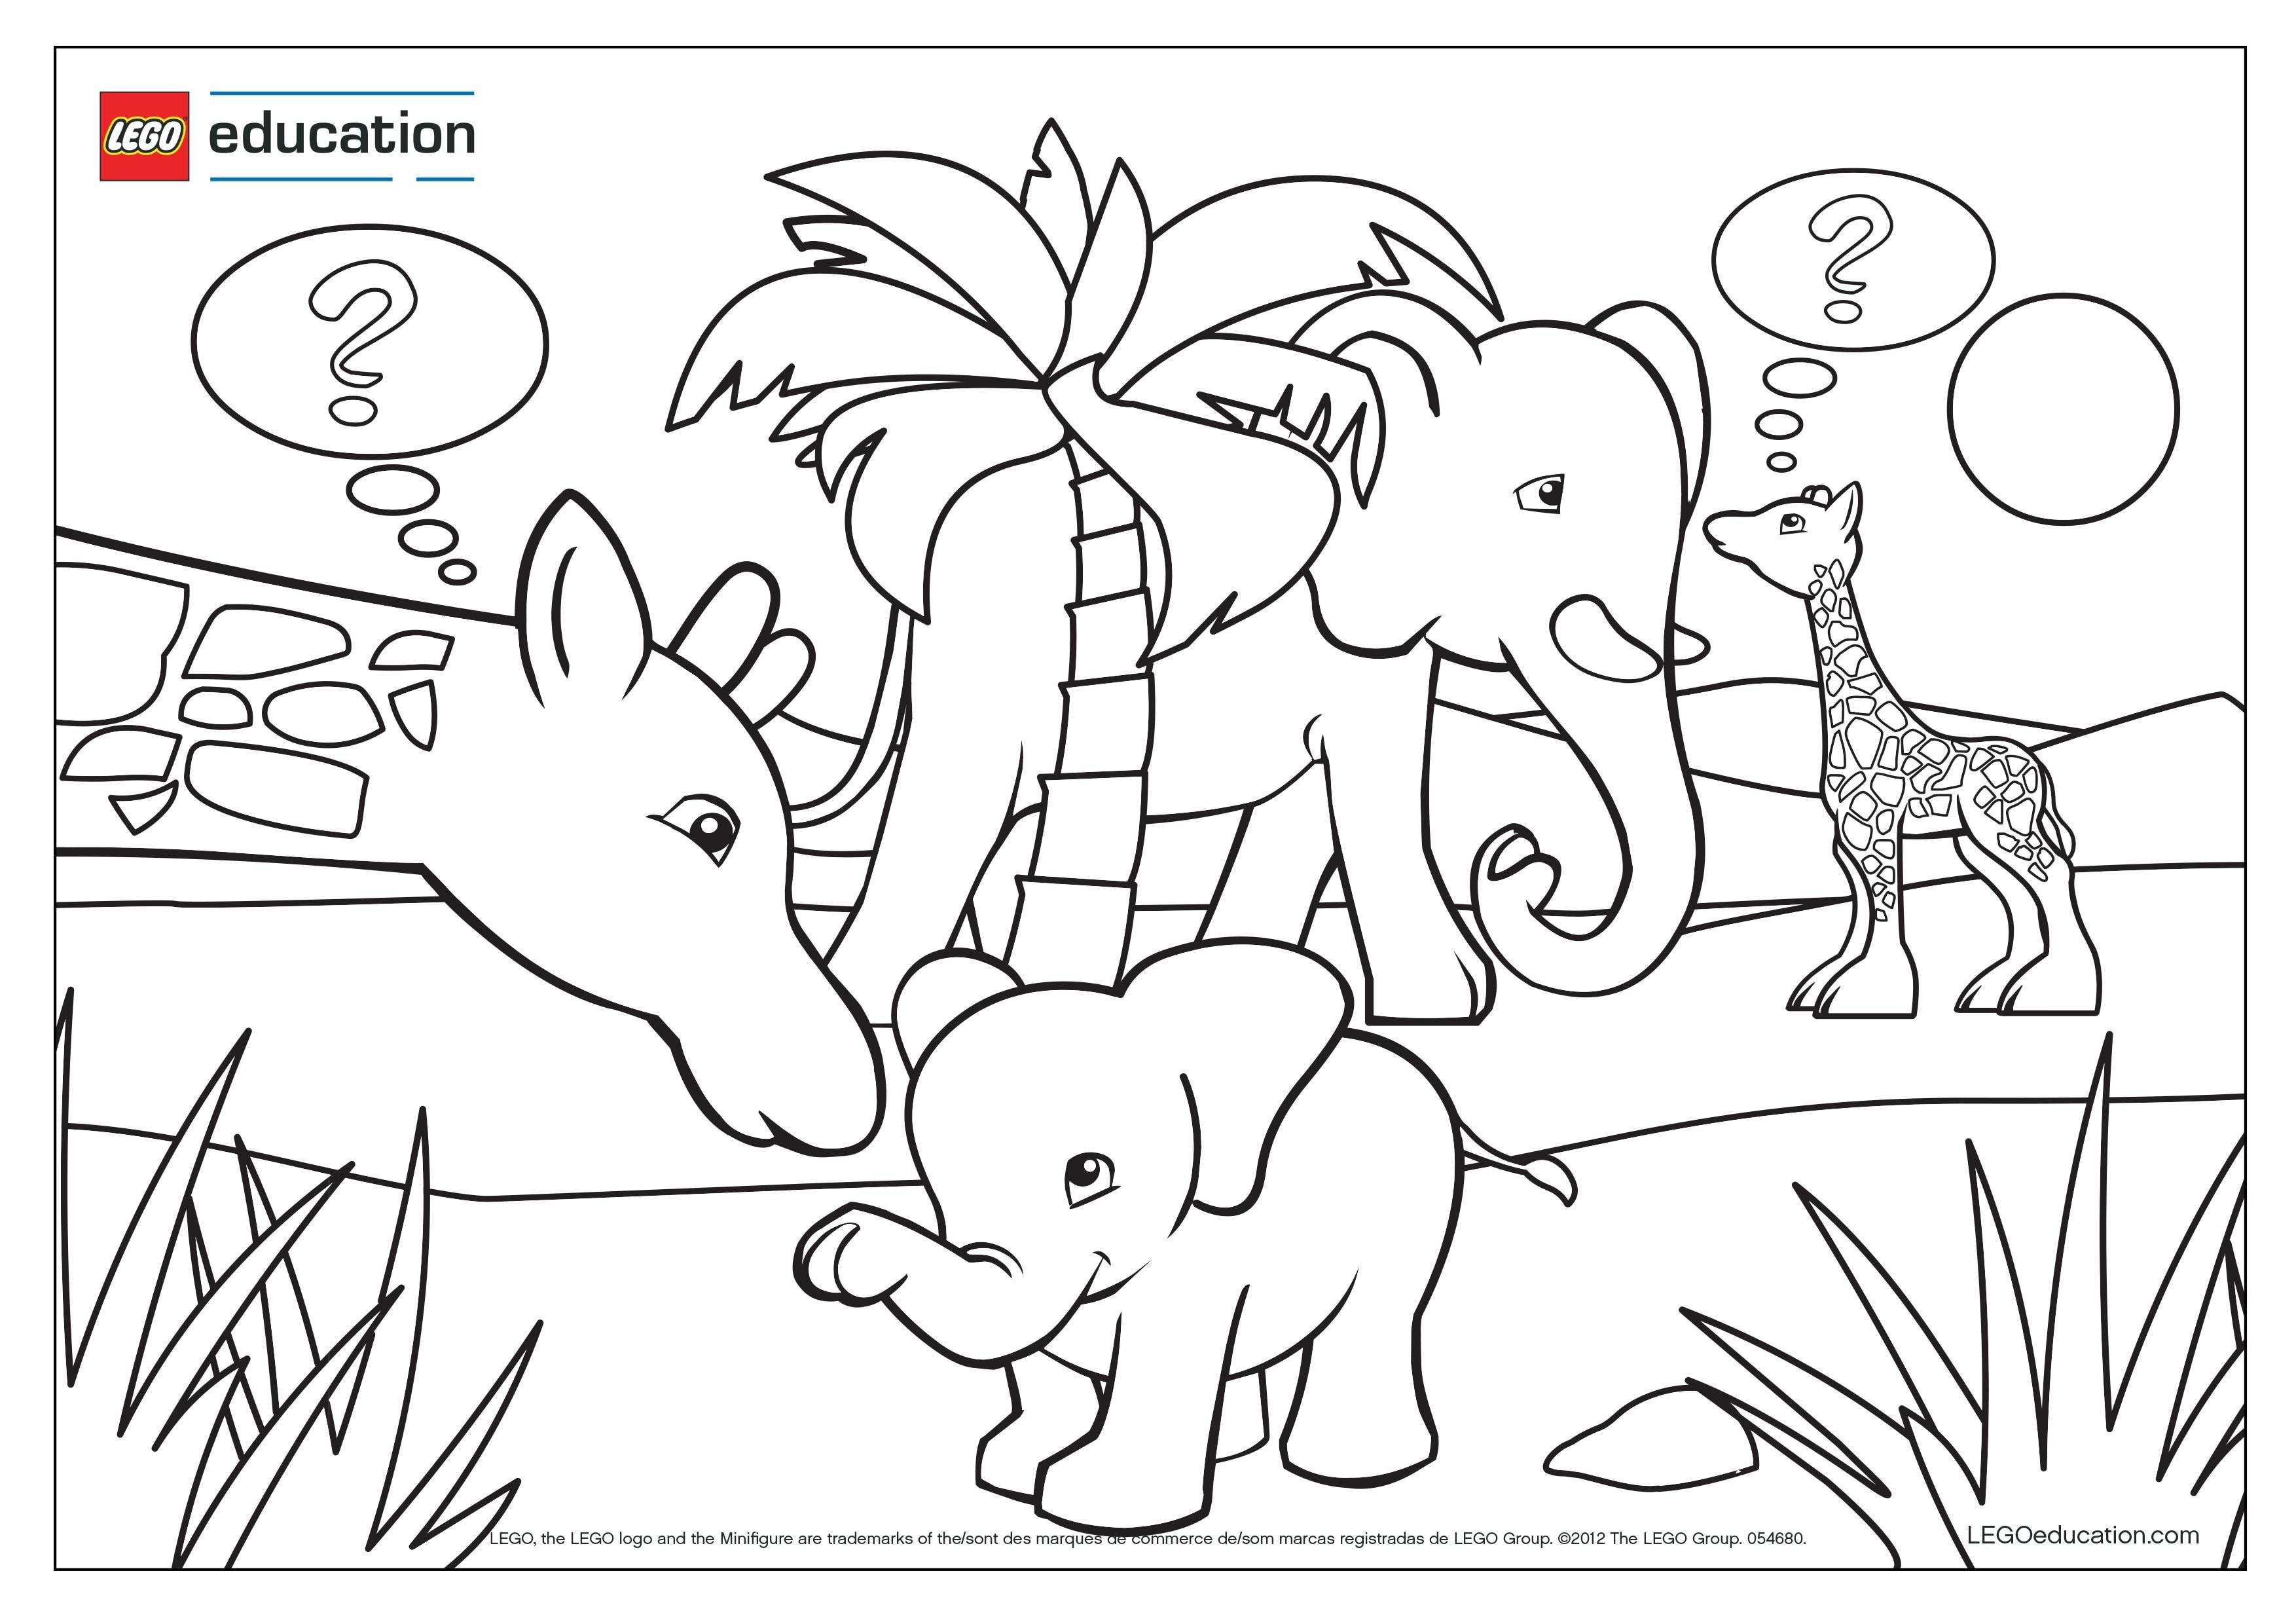 preschool coloring pages support lego education. Black Bedroom Furniture Sets. Home Design Ideas